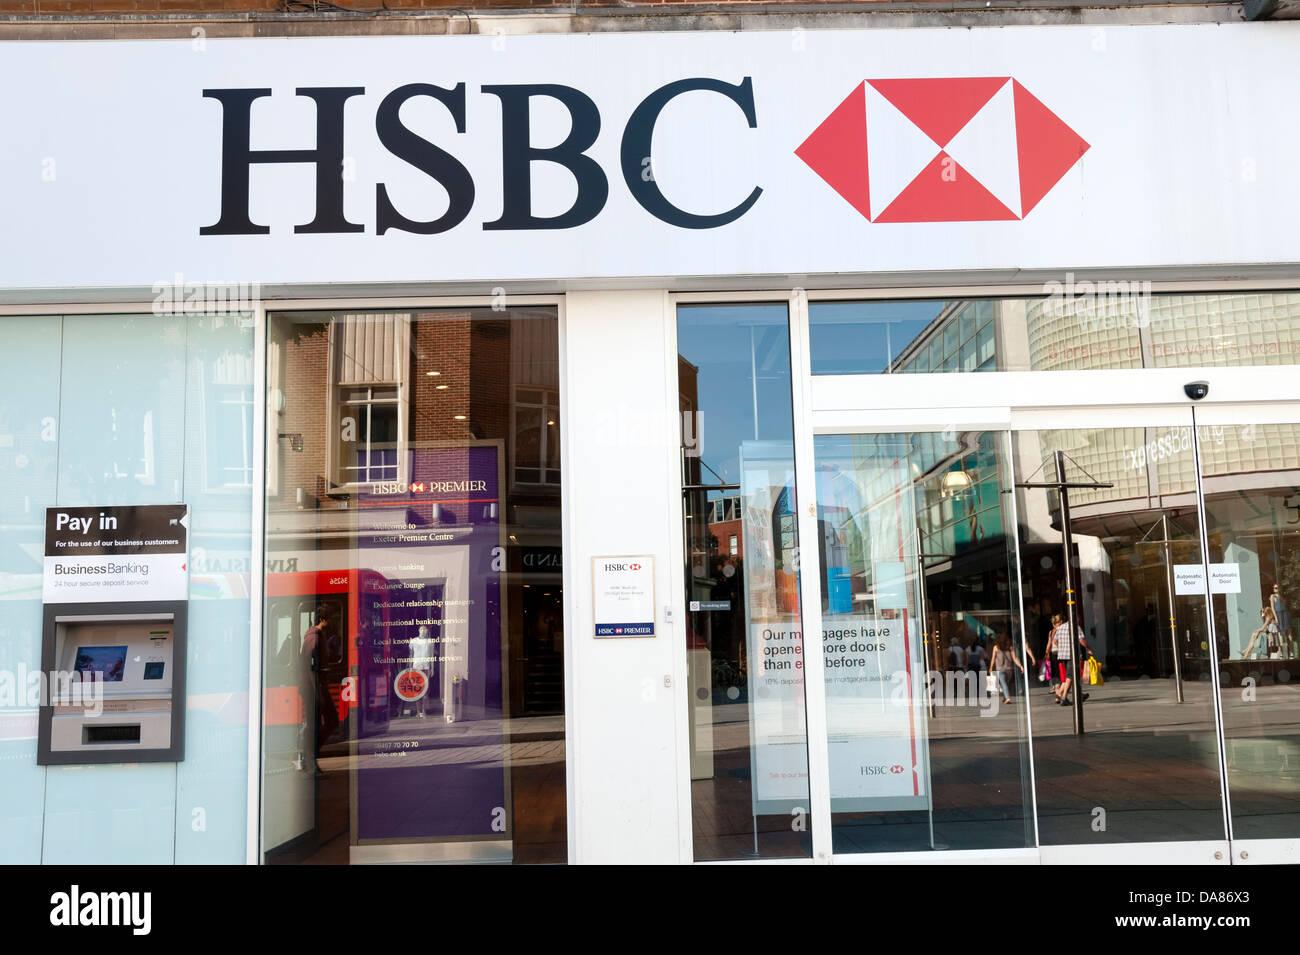 La banque HSBC, au Royaume-Uni. Photo Stock